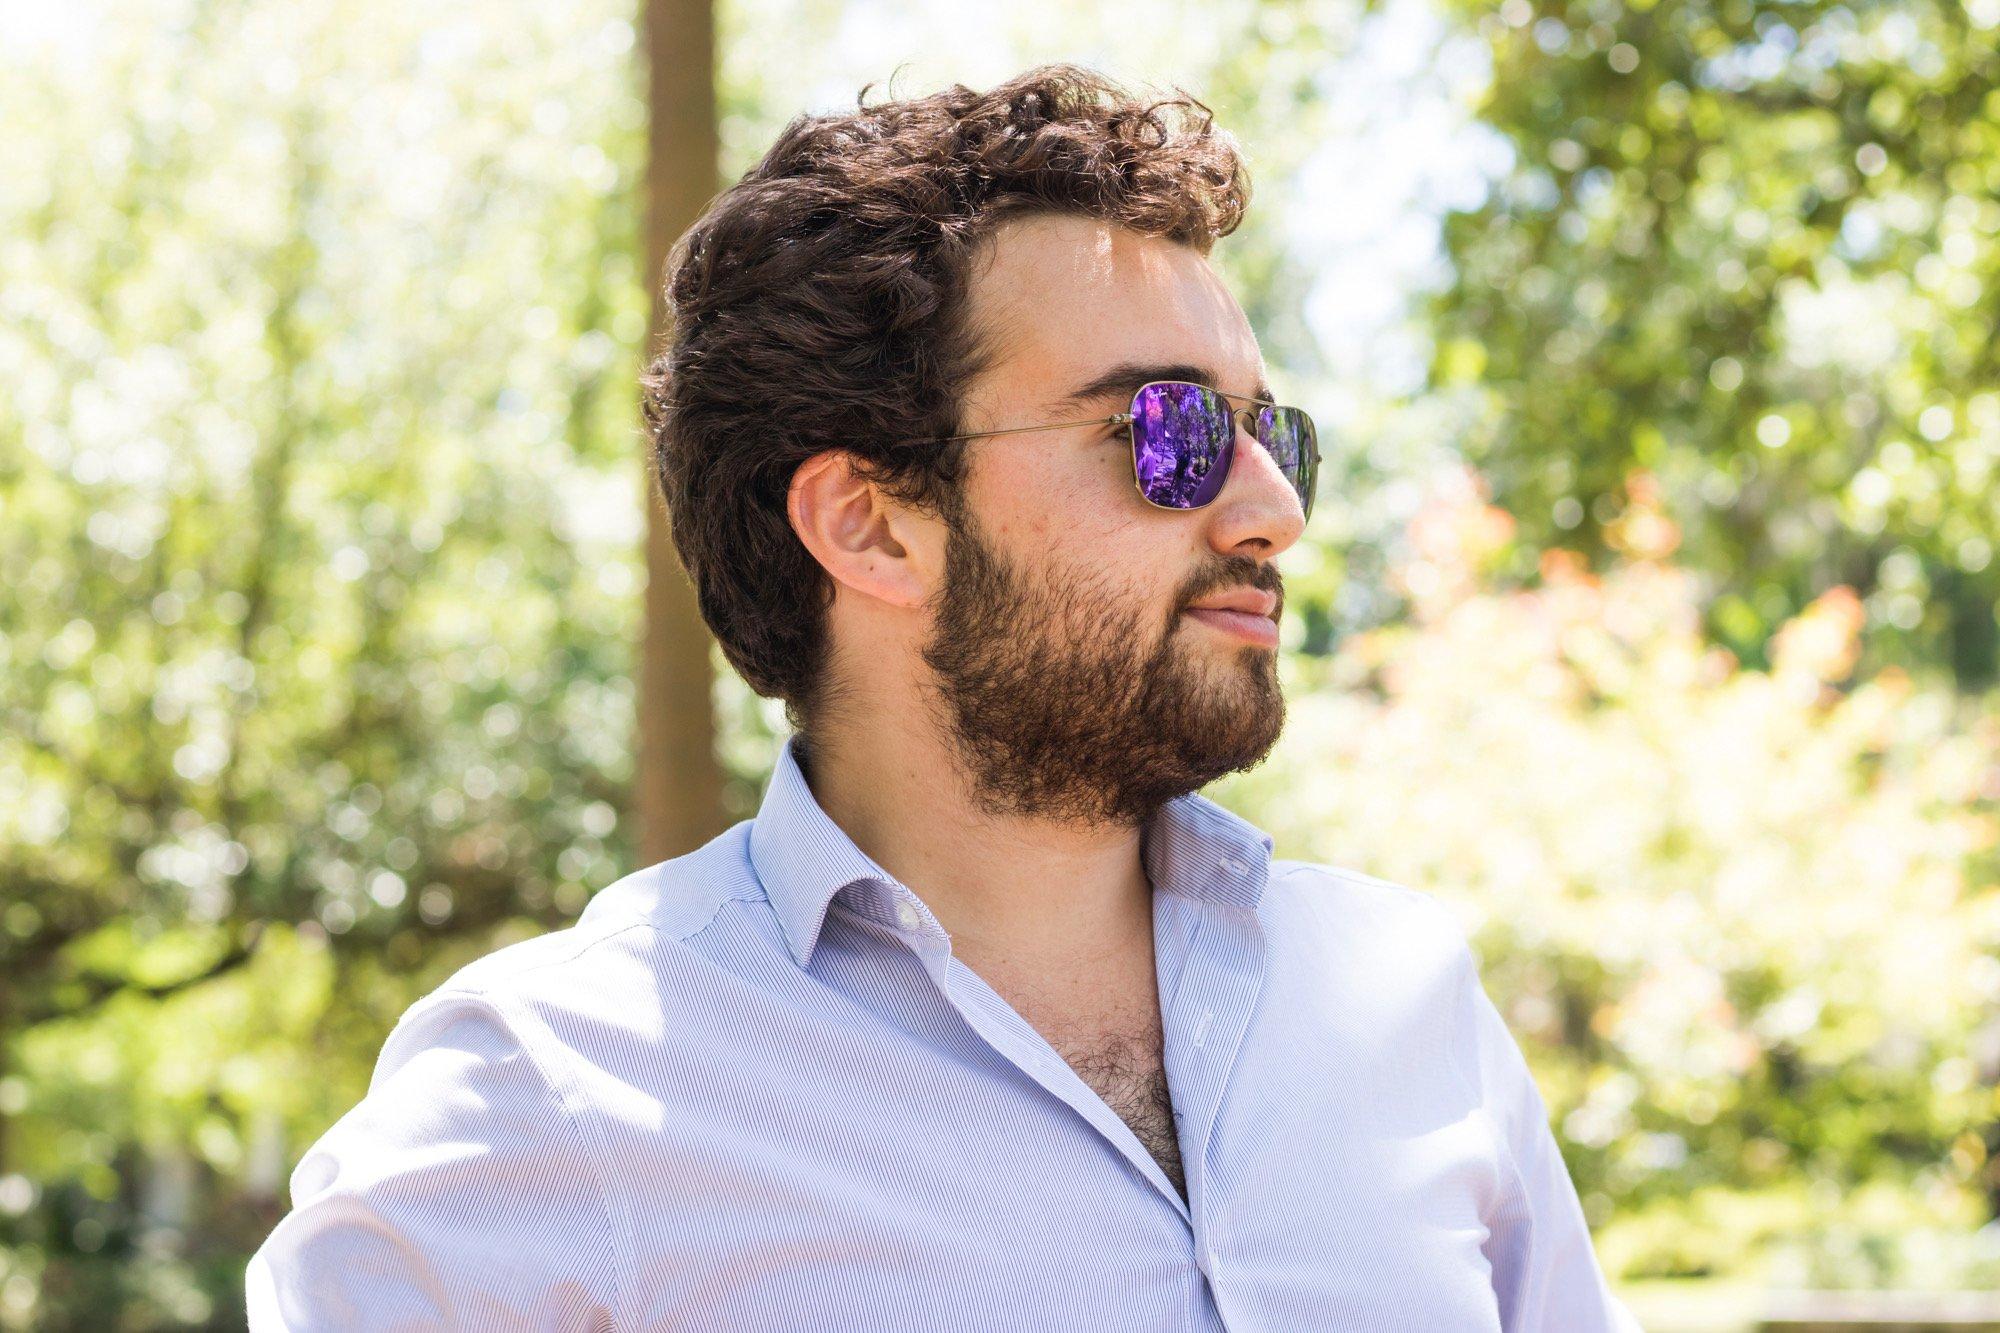 A bearded Joshua Prem with shades on, profile shot